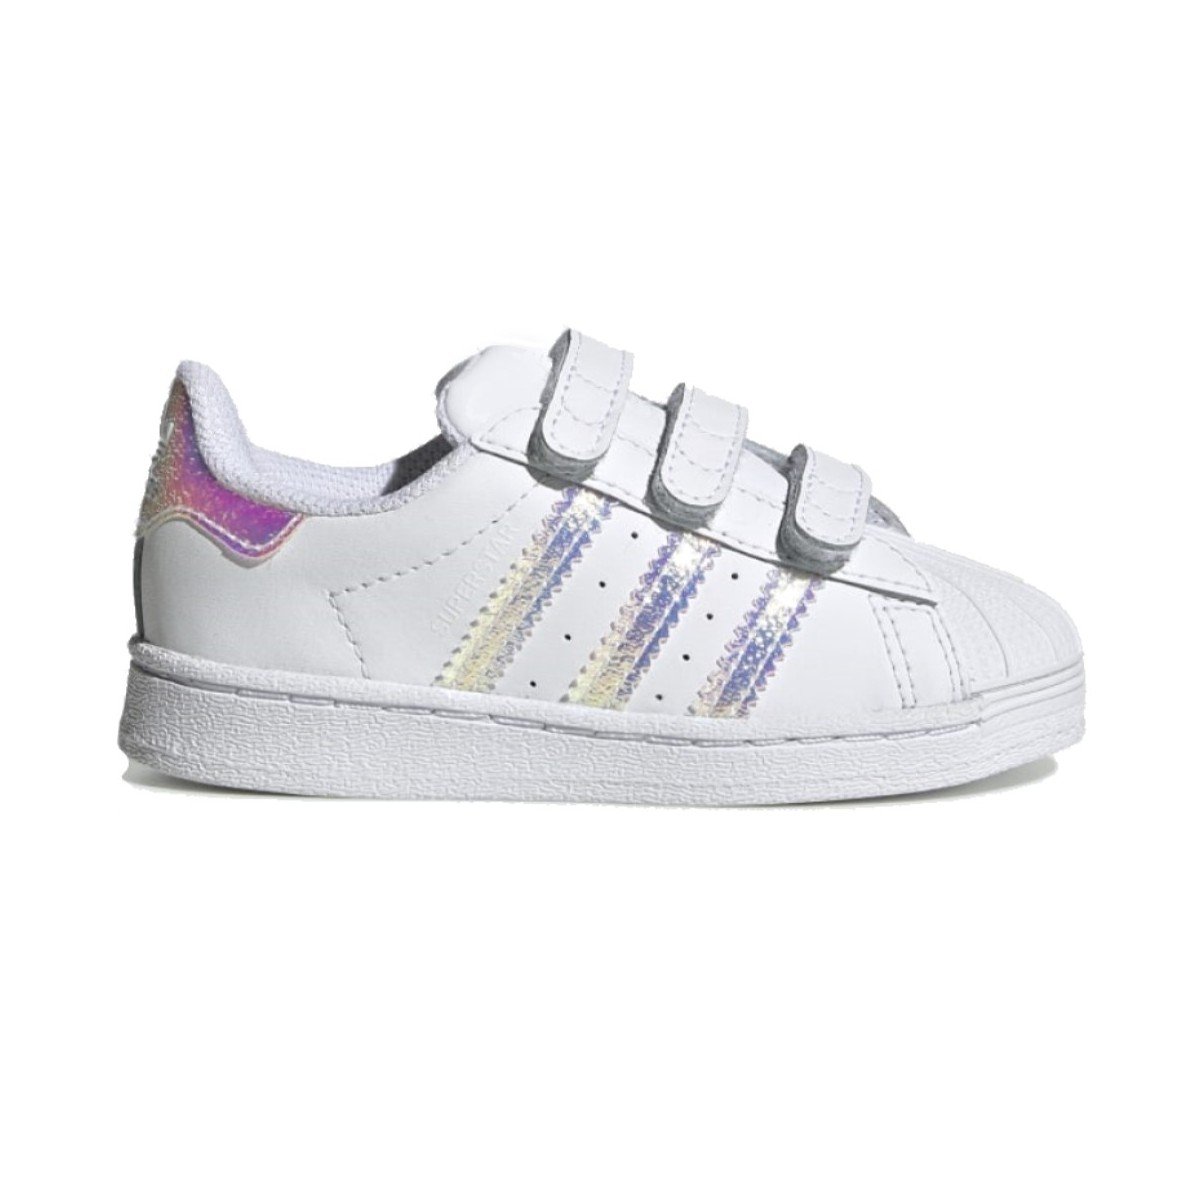 Adidas Superstar CF Infant bianca con dettagli iridescenti FV3657